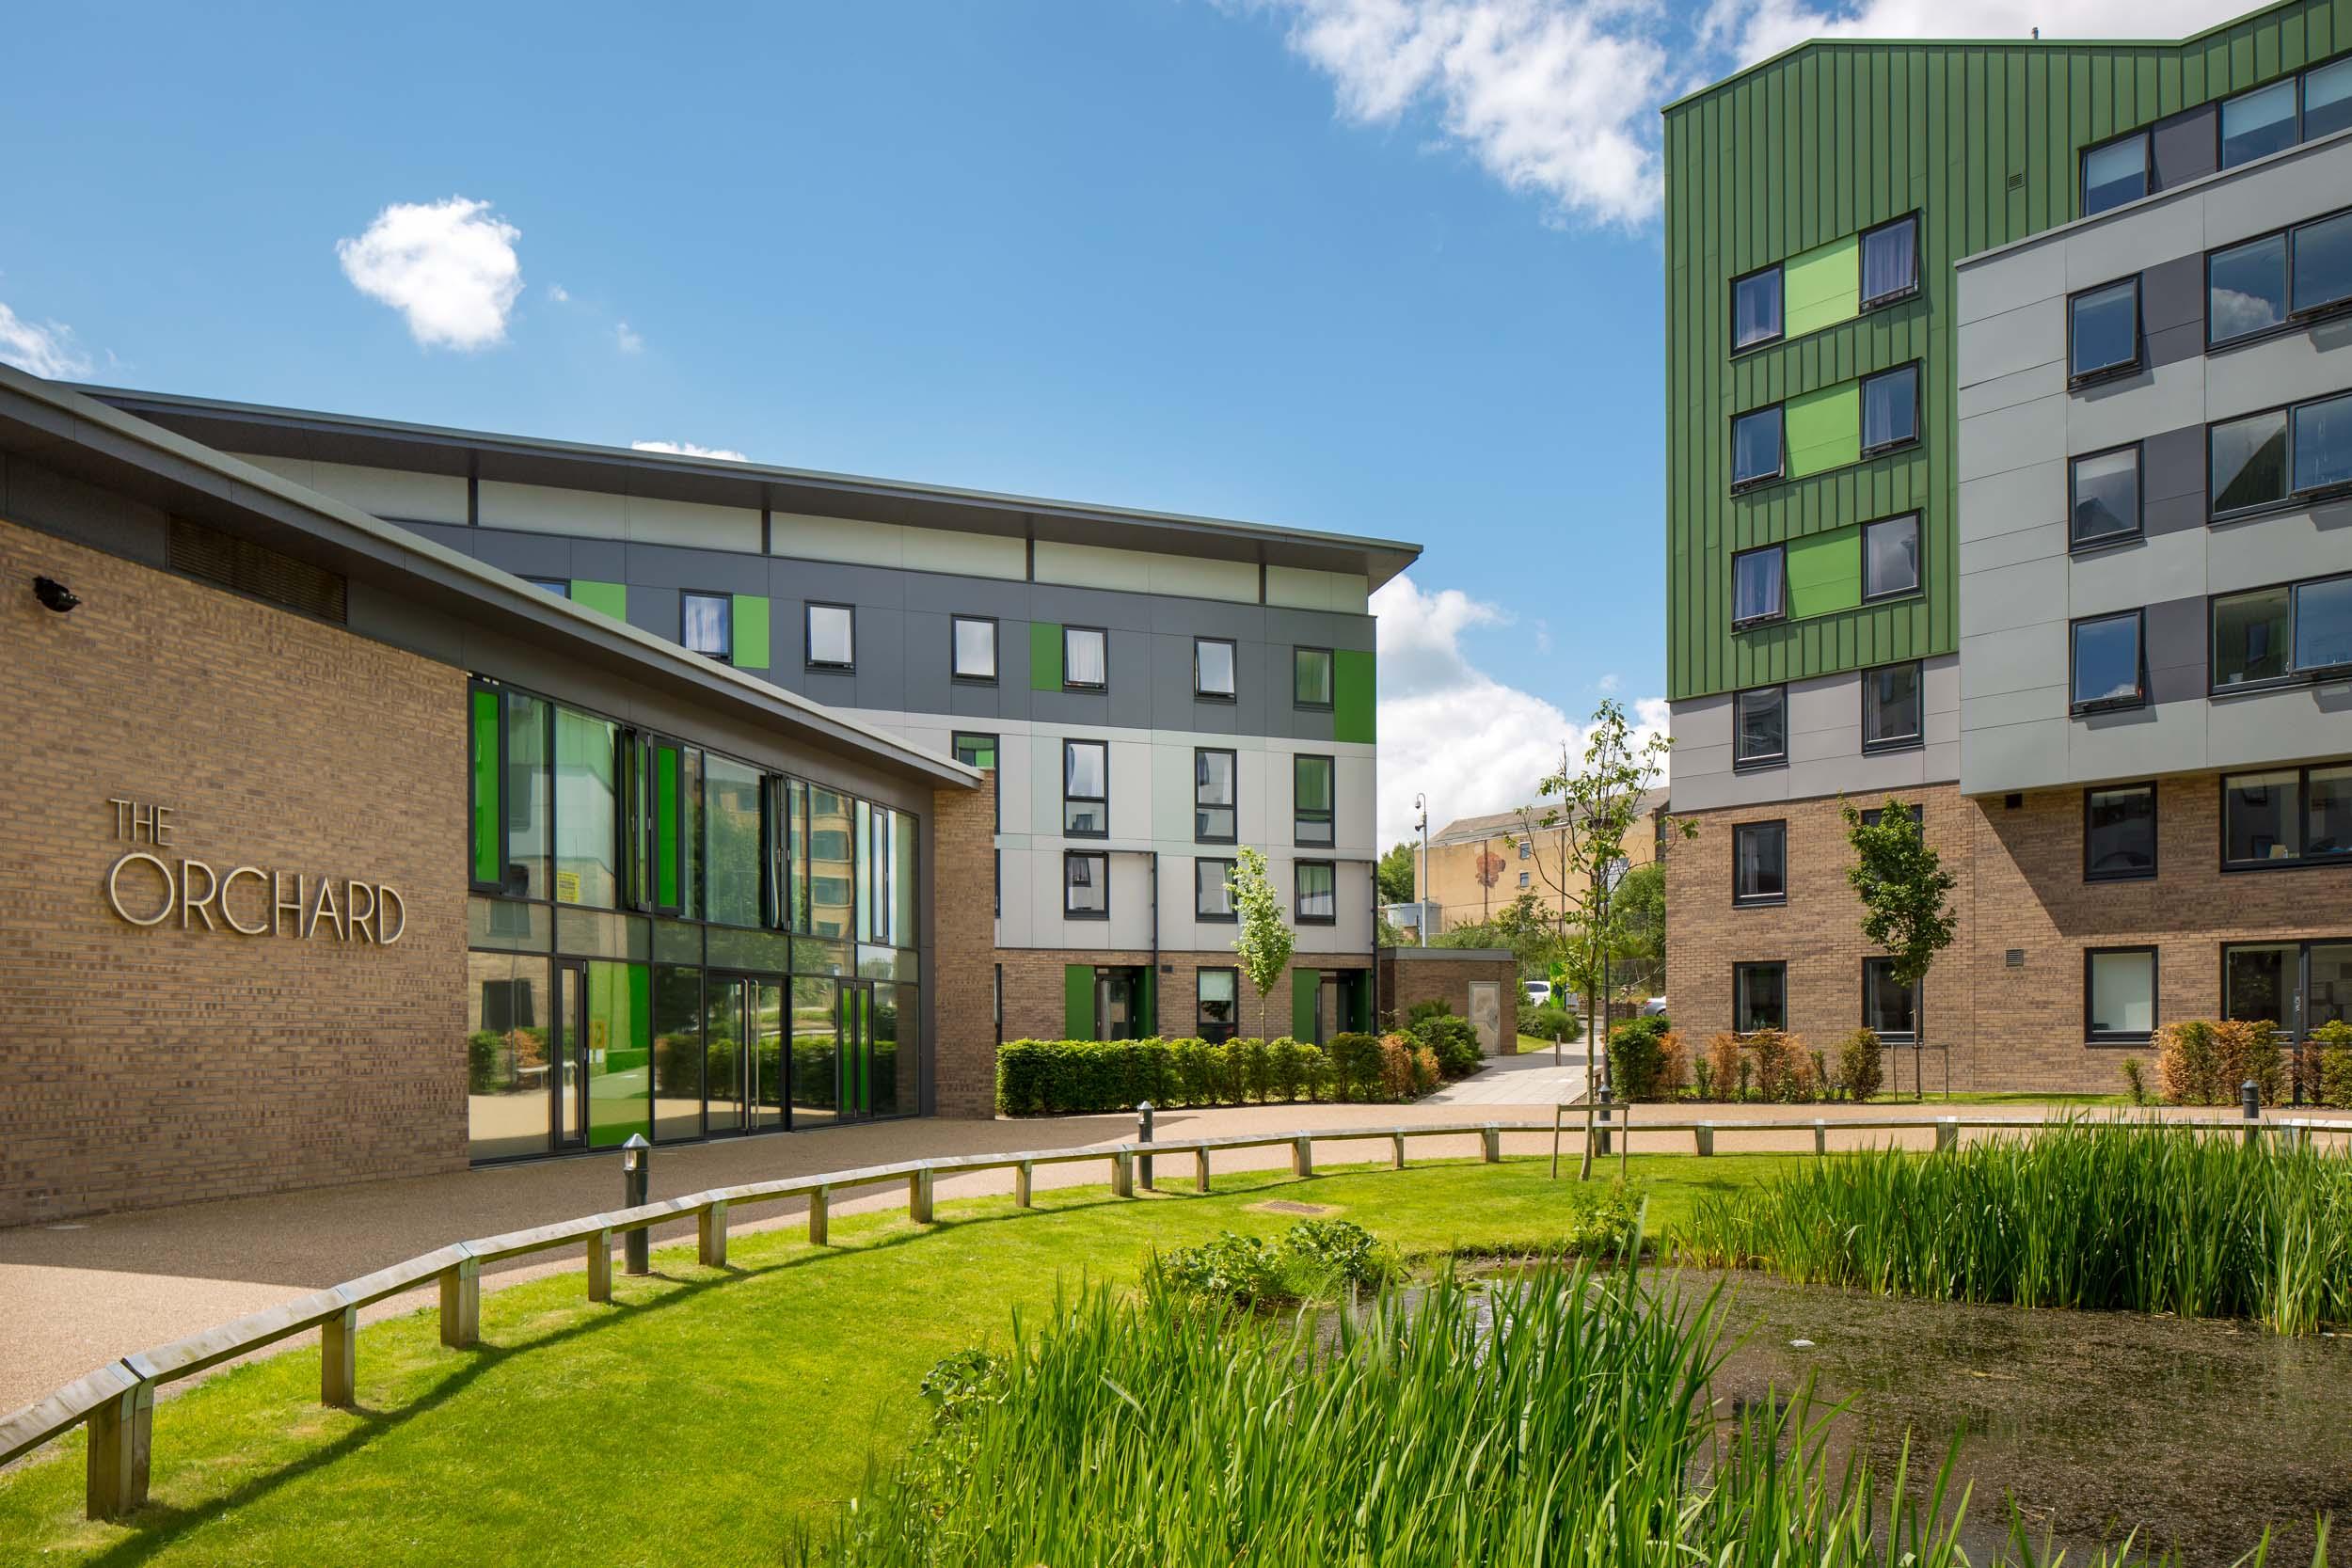 the green bradford student flats 2 architectural exterior.jpg